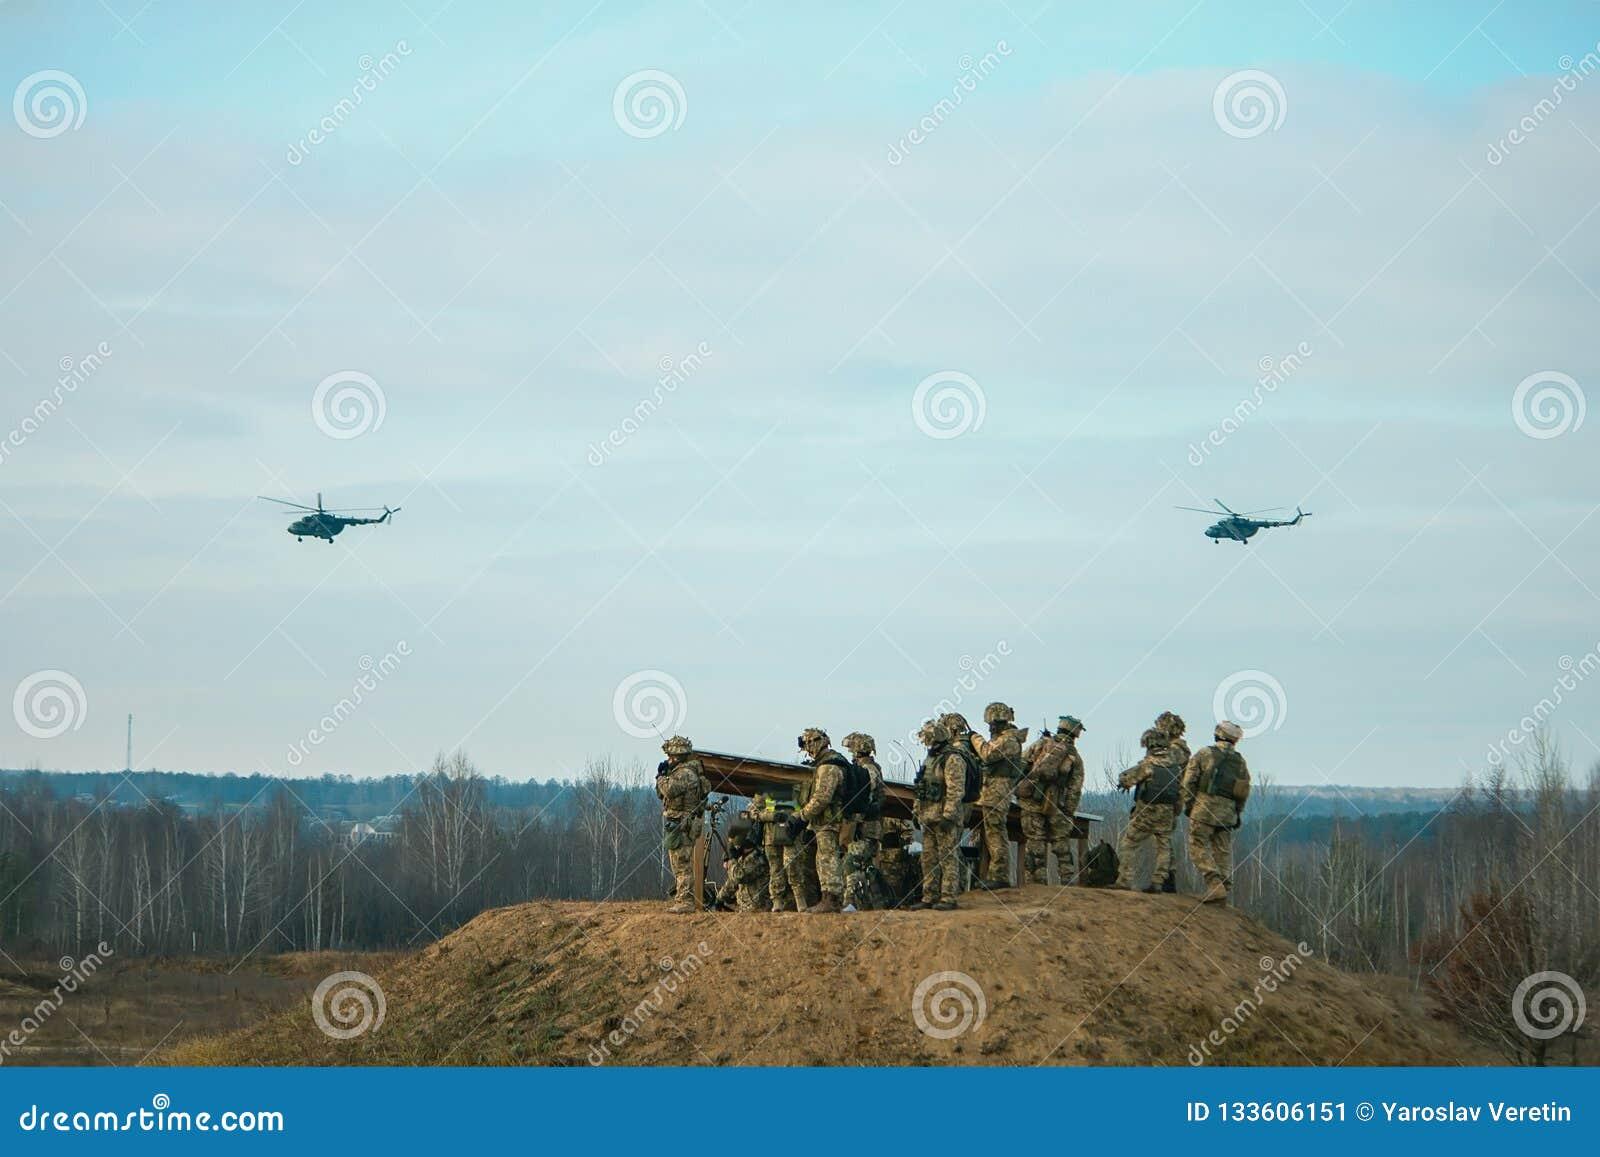 Militarni wojsko helikoptery lata nad wojskowego pole